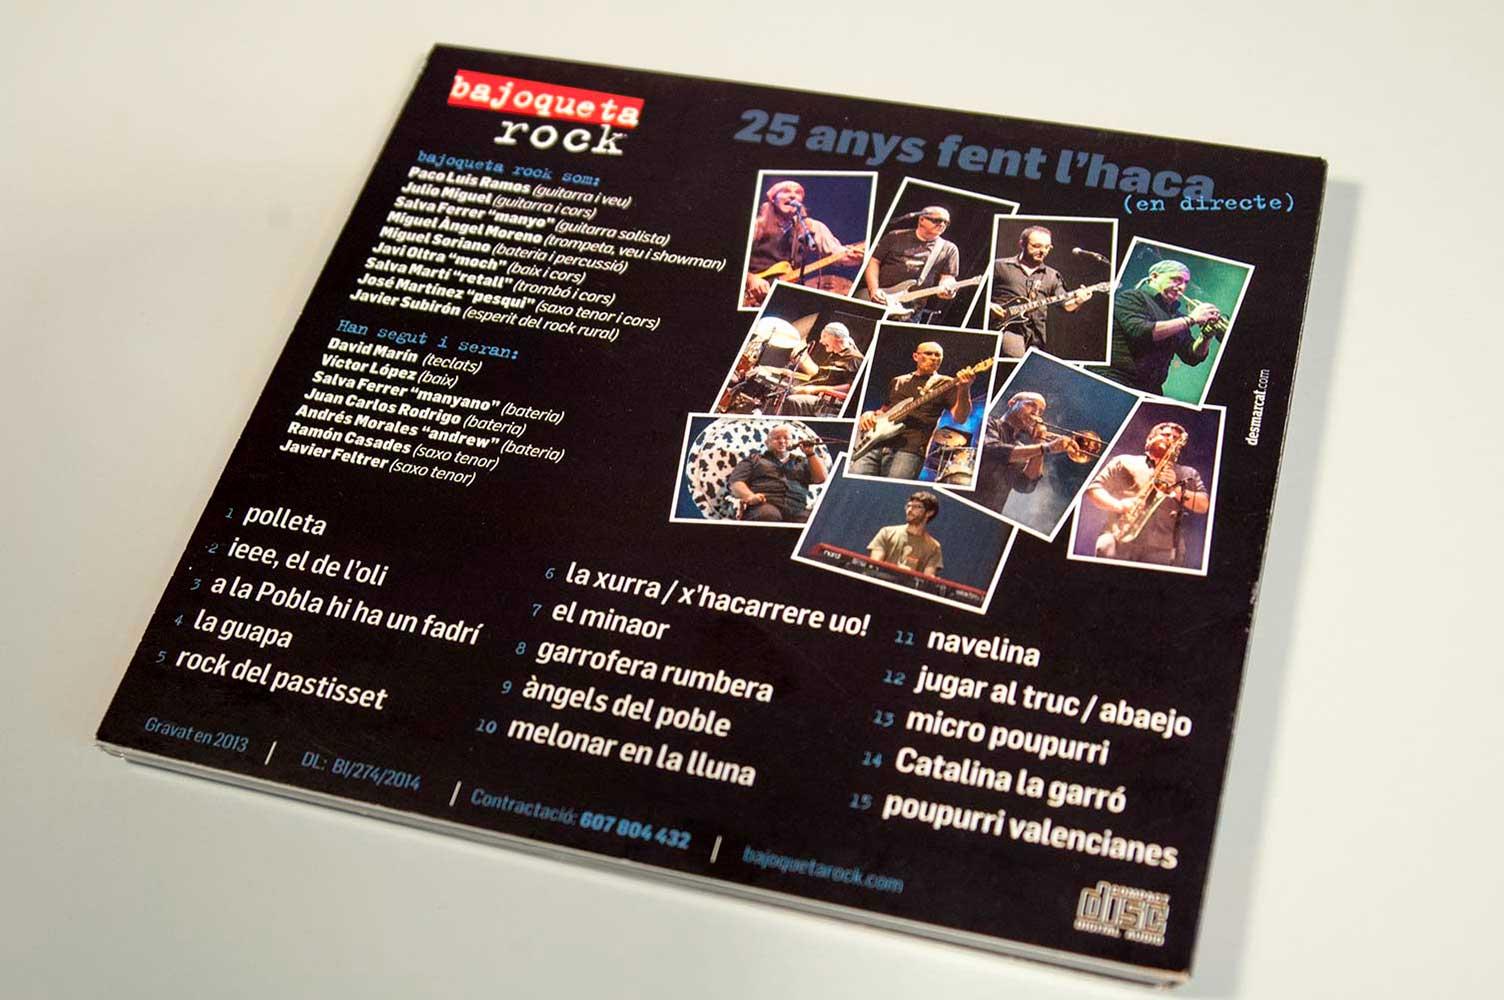 Diseño CD Bajoqueta rock 25 aniversari trasera